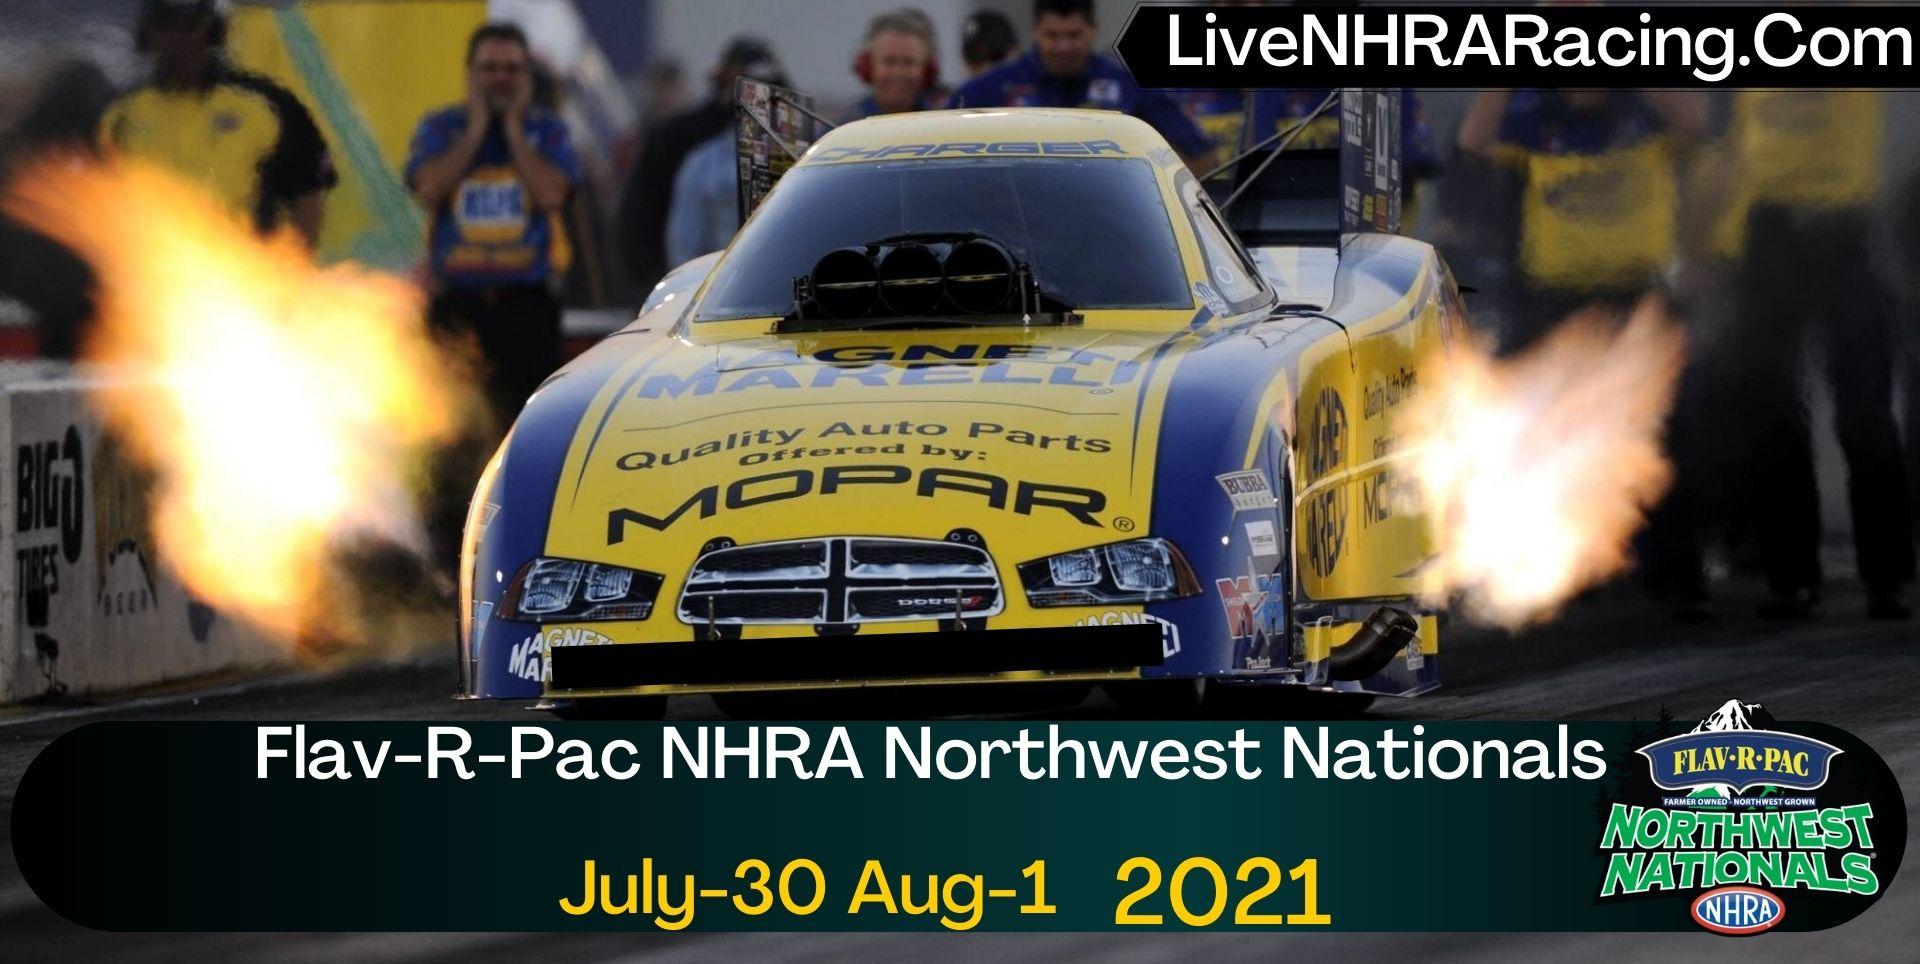 Flav-R-Pac NHRA Northwest Nationals Live Stream 2021